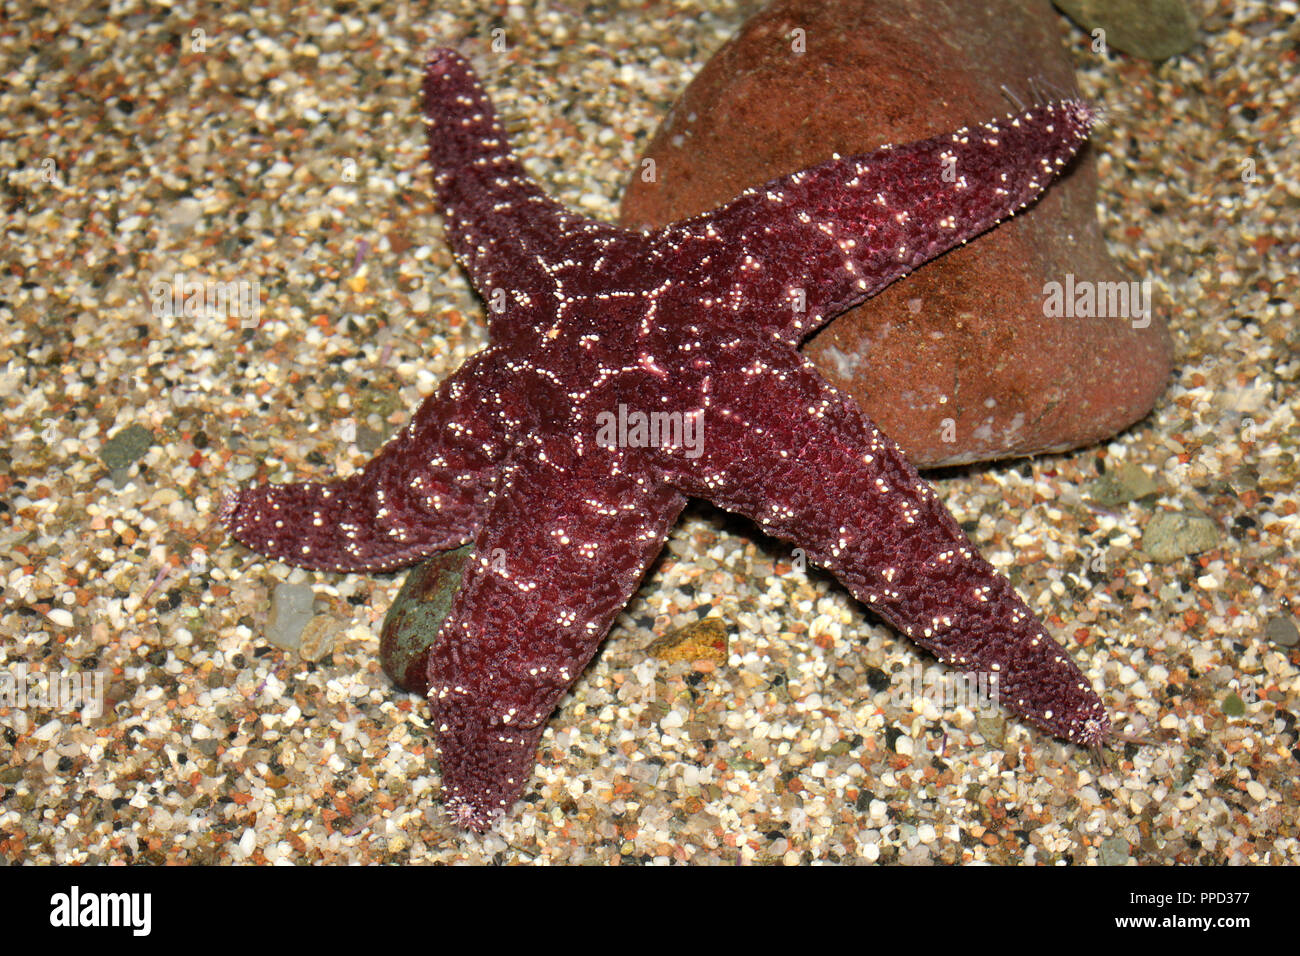 Estrellas ocre Pisaster ochraceus Imagen De Stock